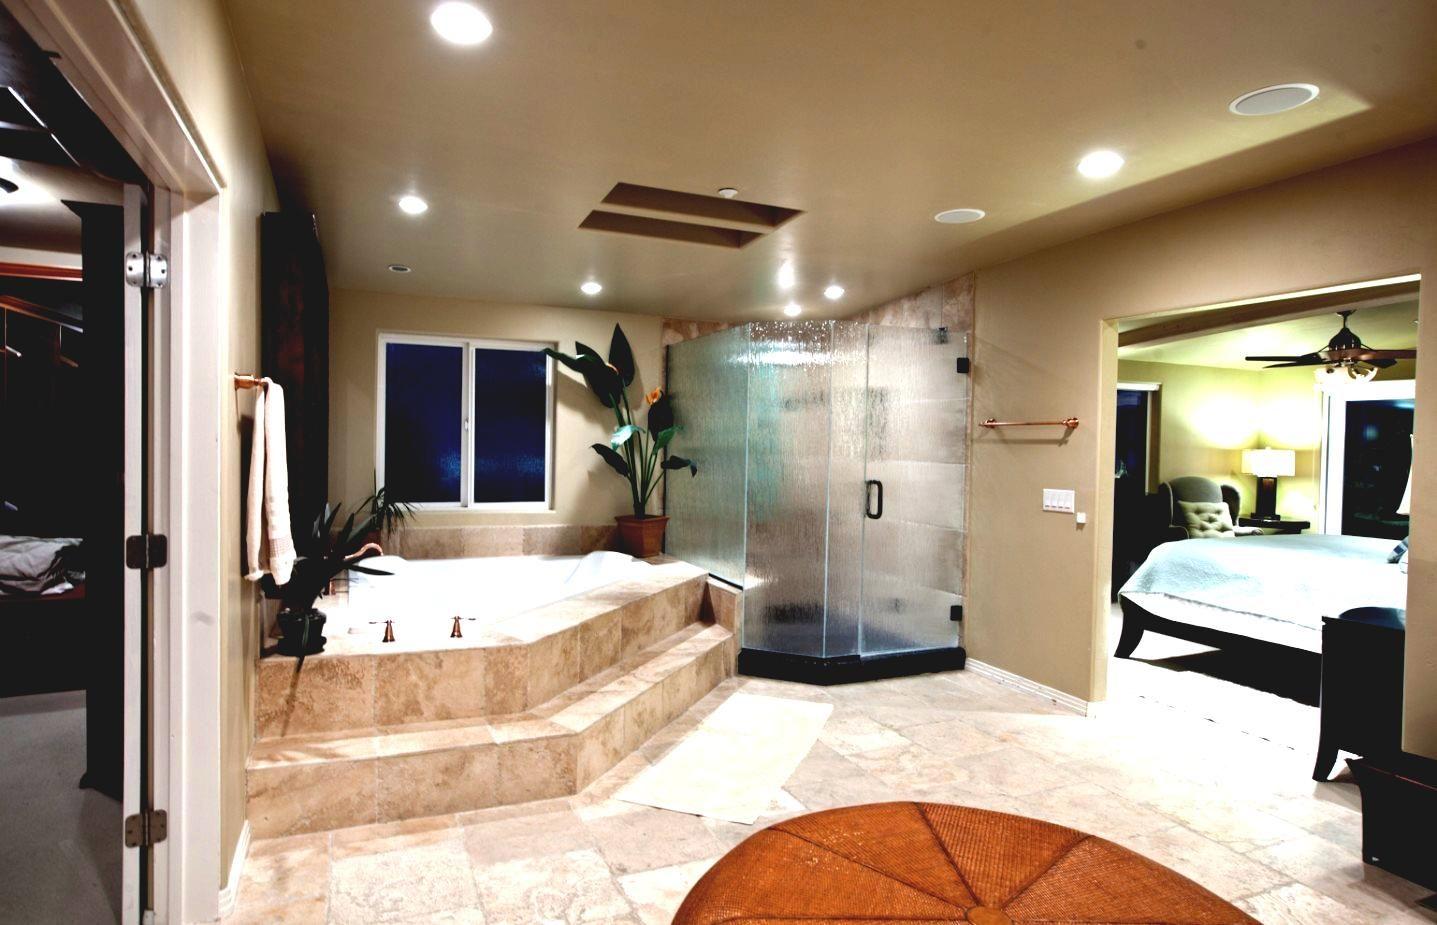 Different Types Of Bathroom Interior Design That Inspire Master Bedroom Bathroom Master Suite Bathroom Master Bathroom Decor